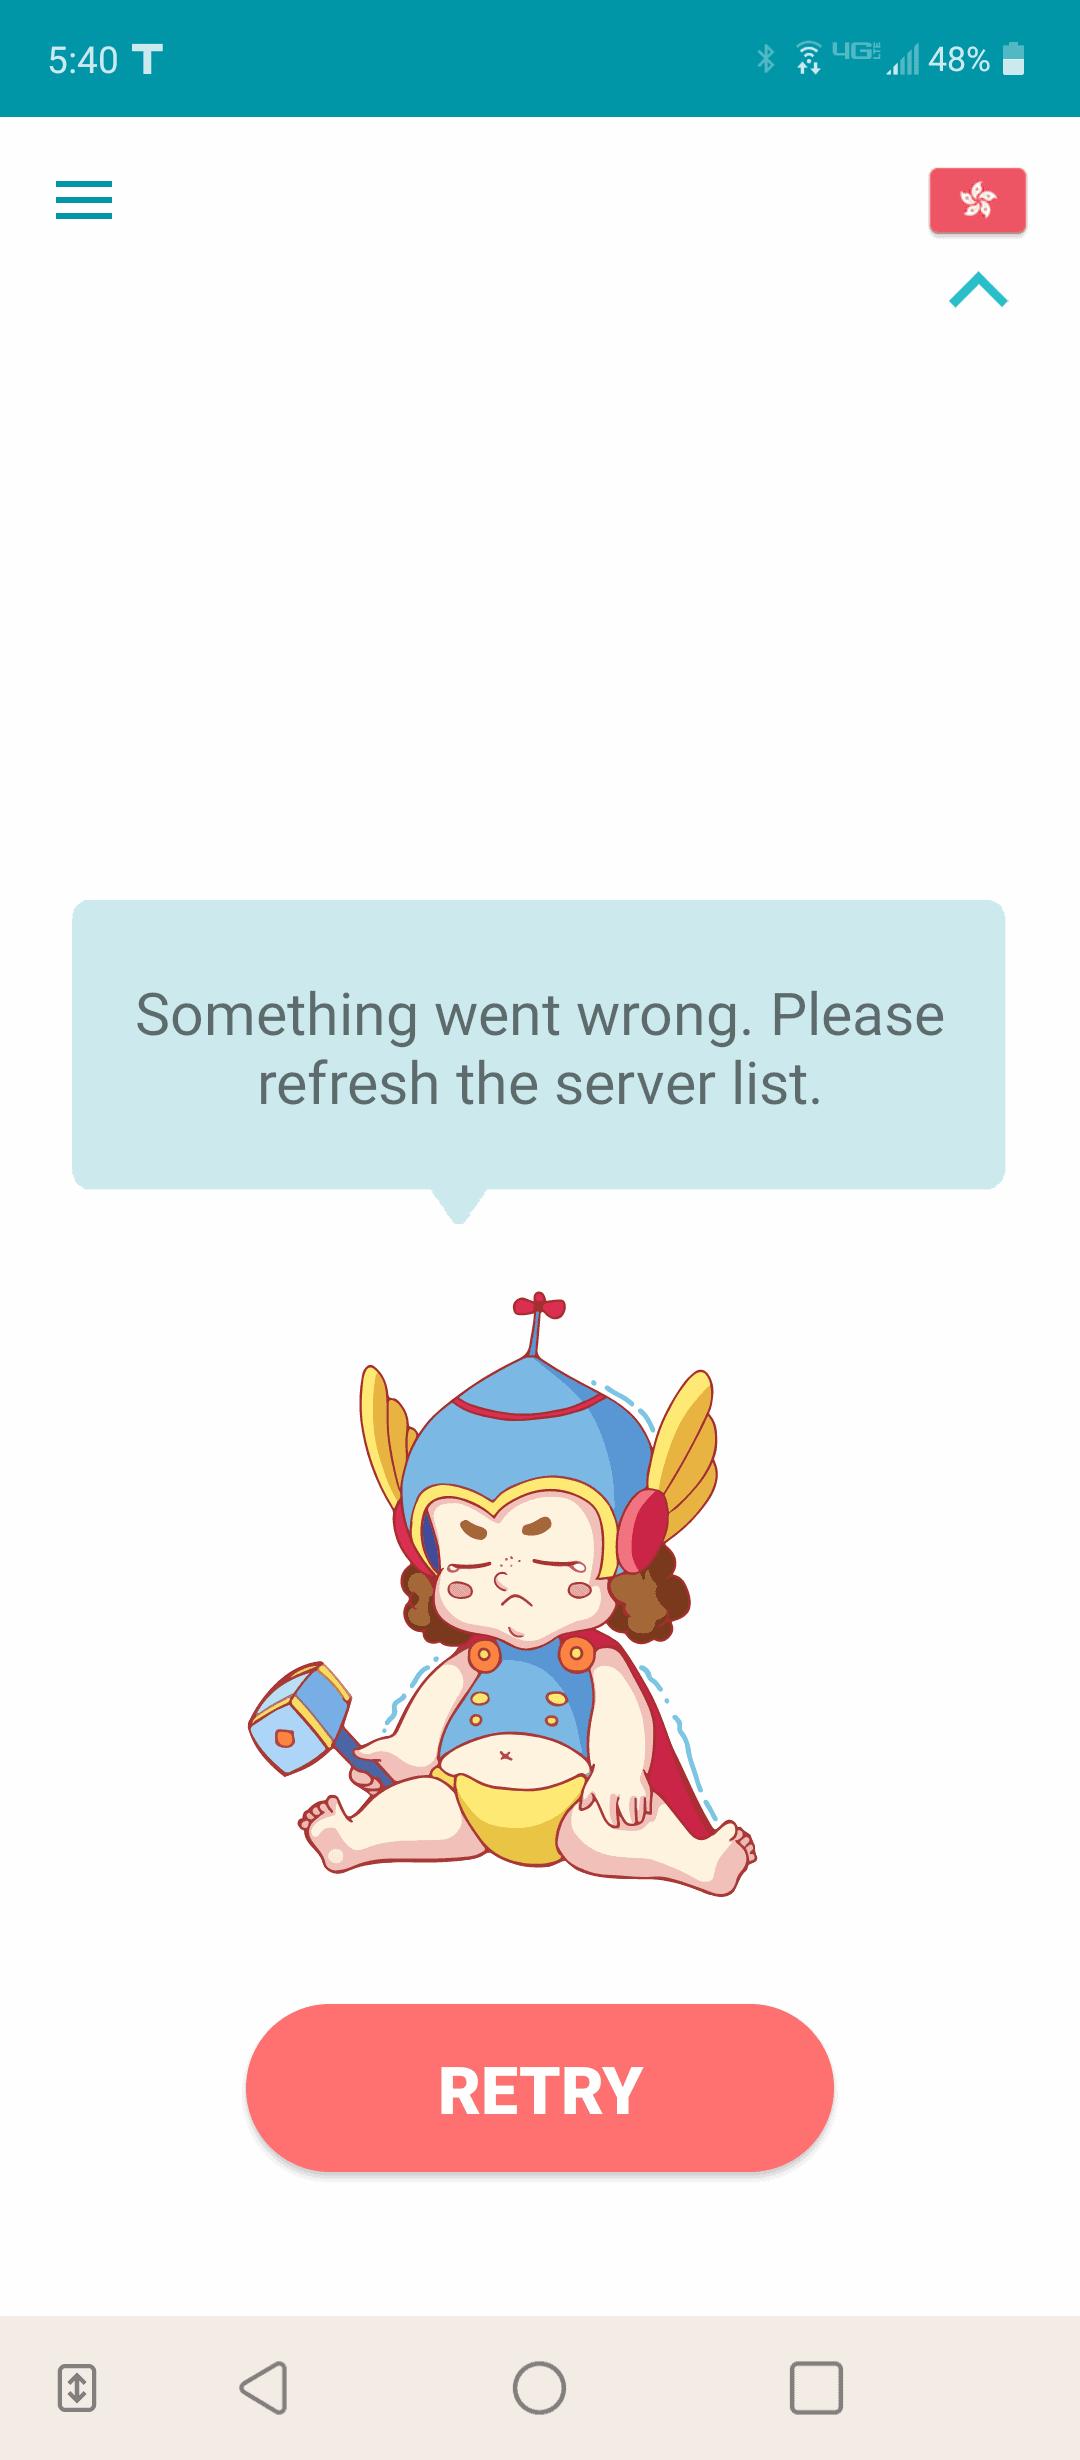 Hong Kong server failure